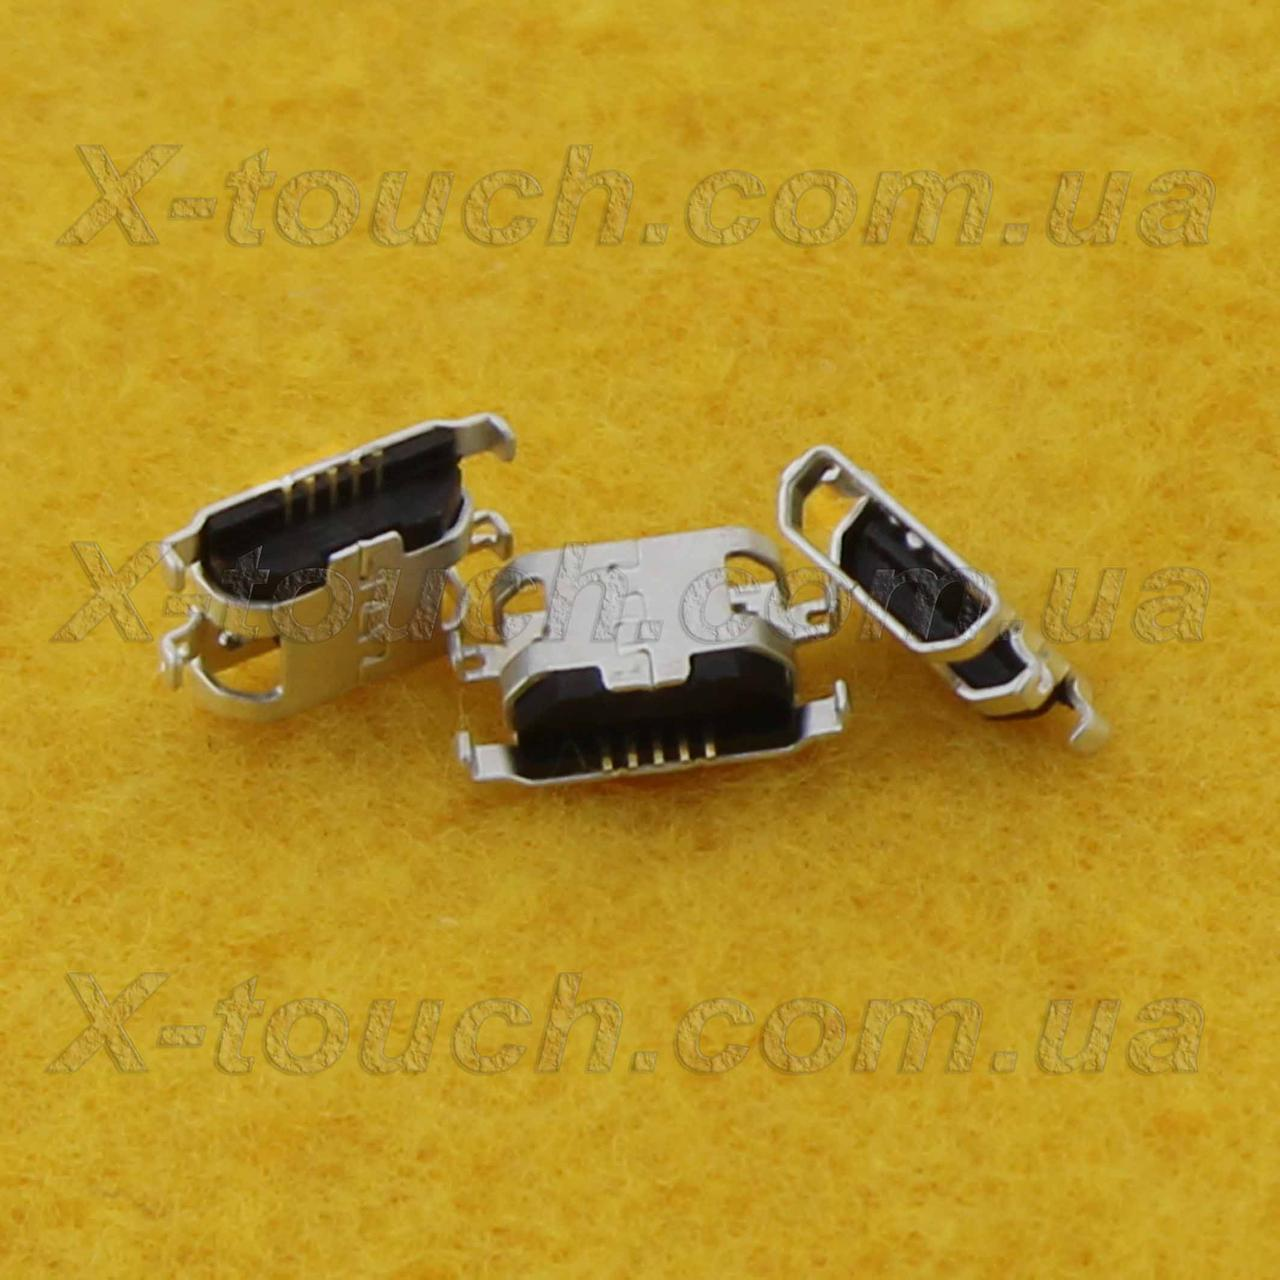 Lenovo A798T разъем зарядки micro-B USB 5pin